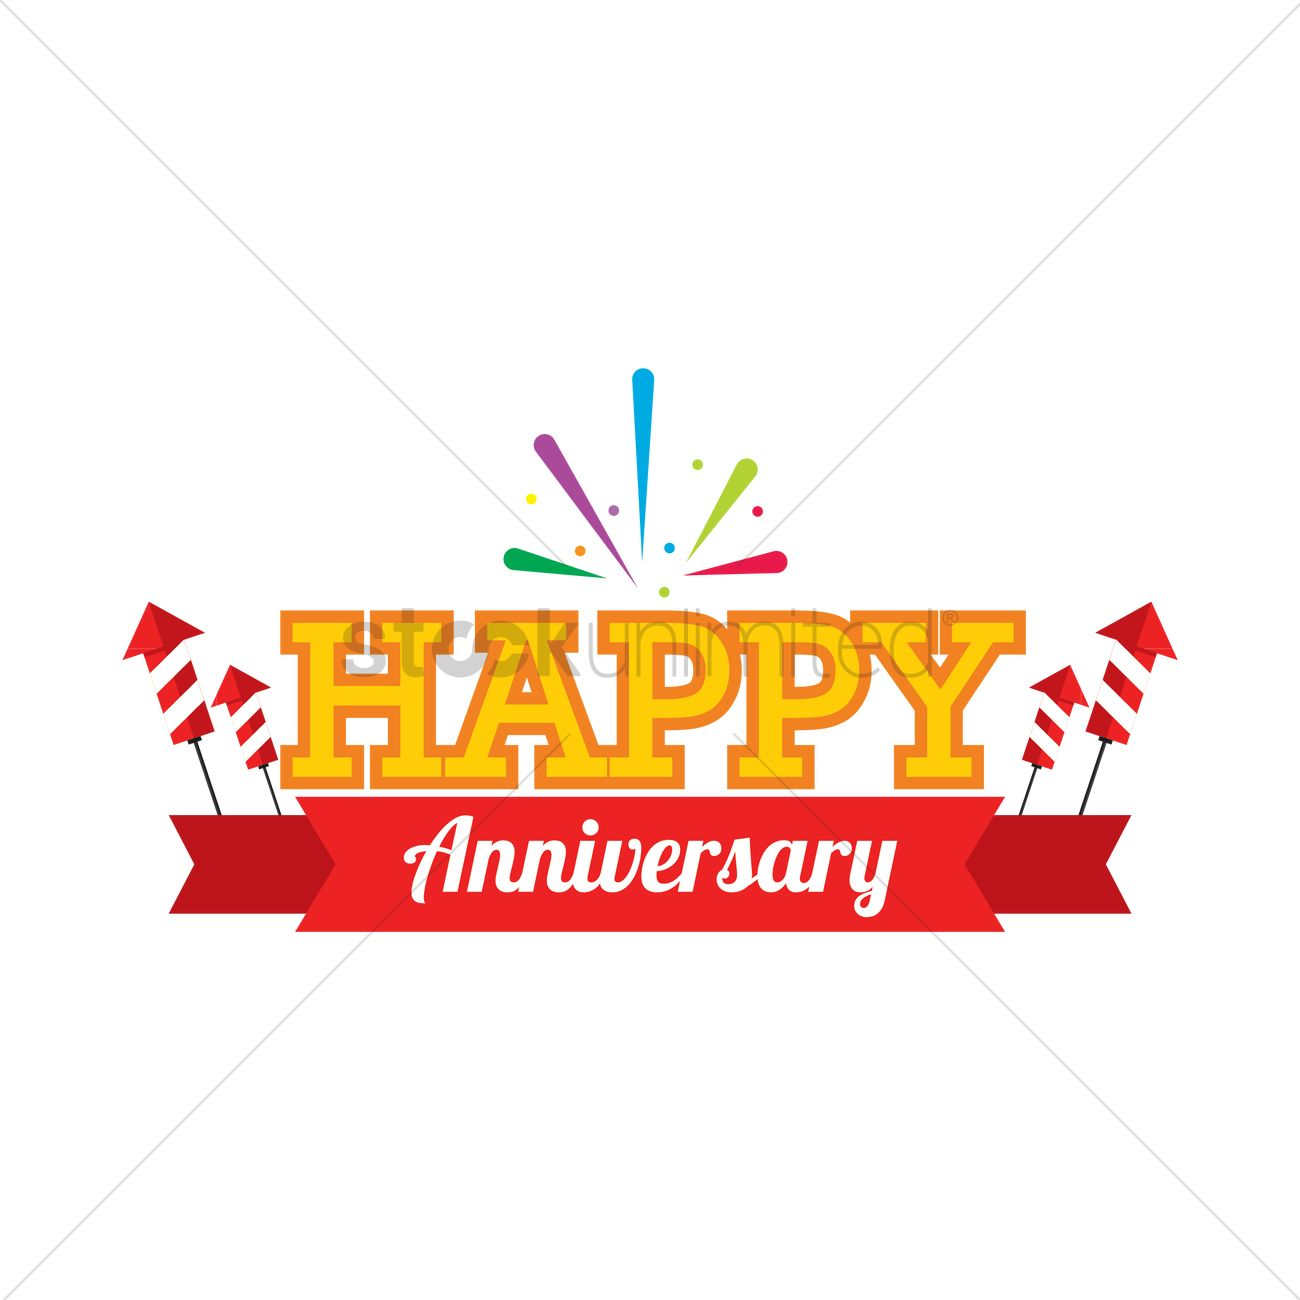 Happy anniversary label Vector Image - 1707692 | StockUnlimited